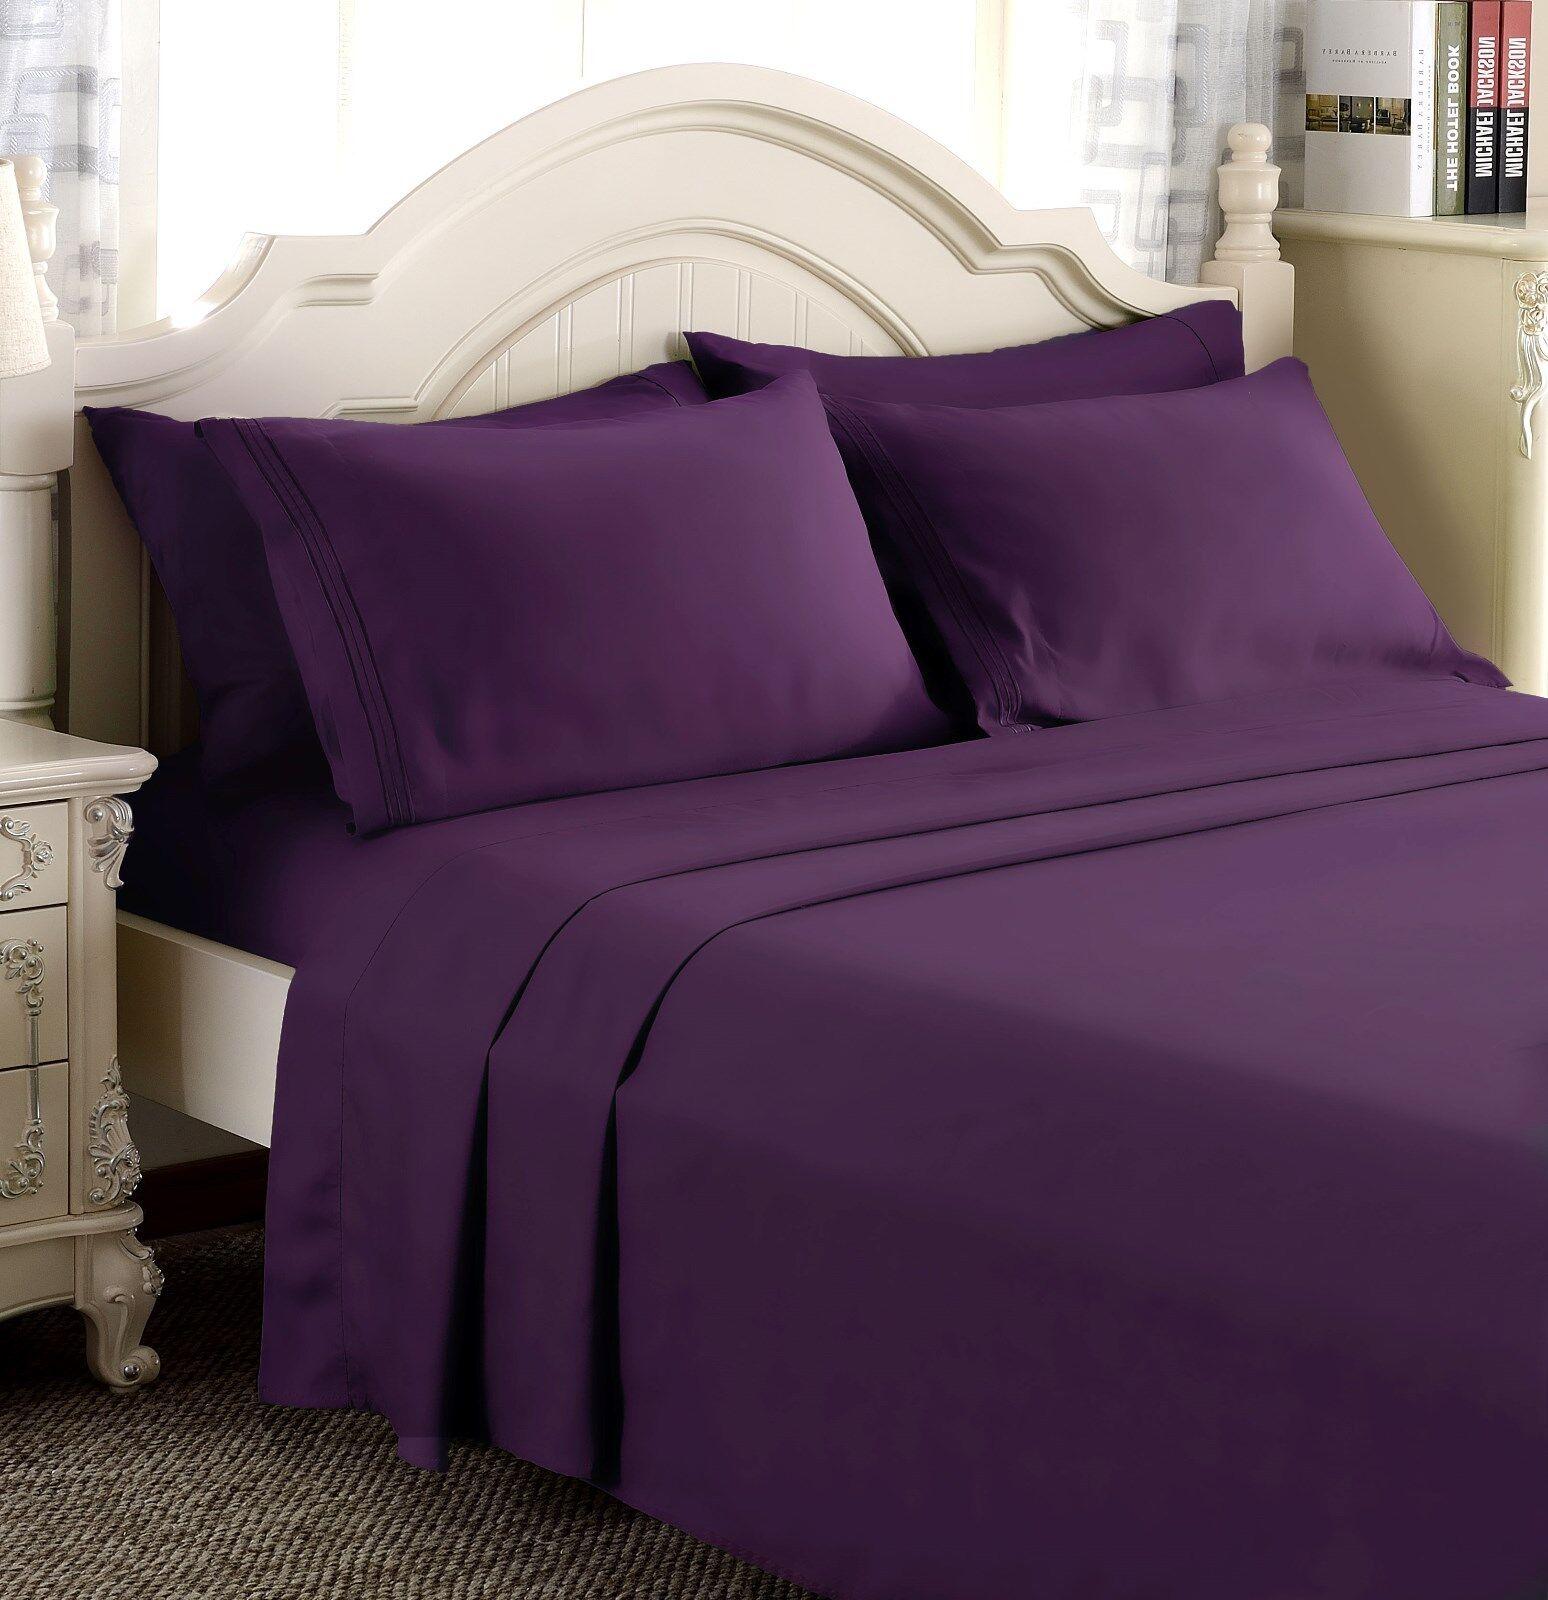 Egyptian Comfort 1800 Count Ultimate 4 Piece Bed Sheet Set Deep Pocket Sheets